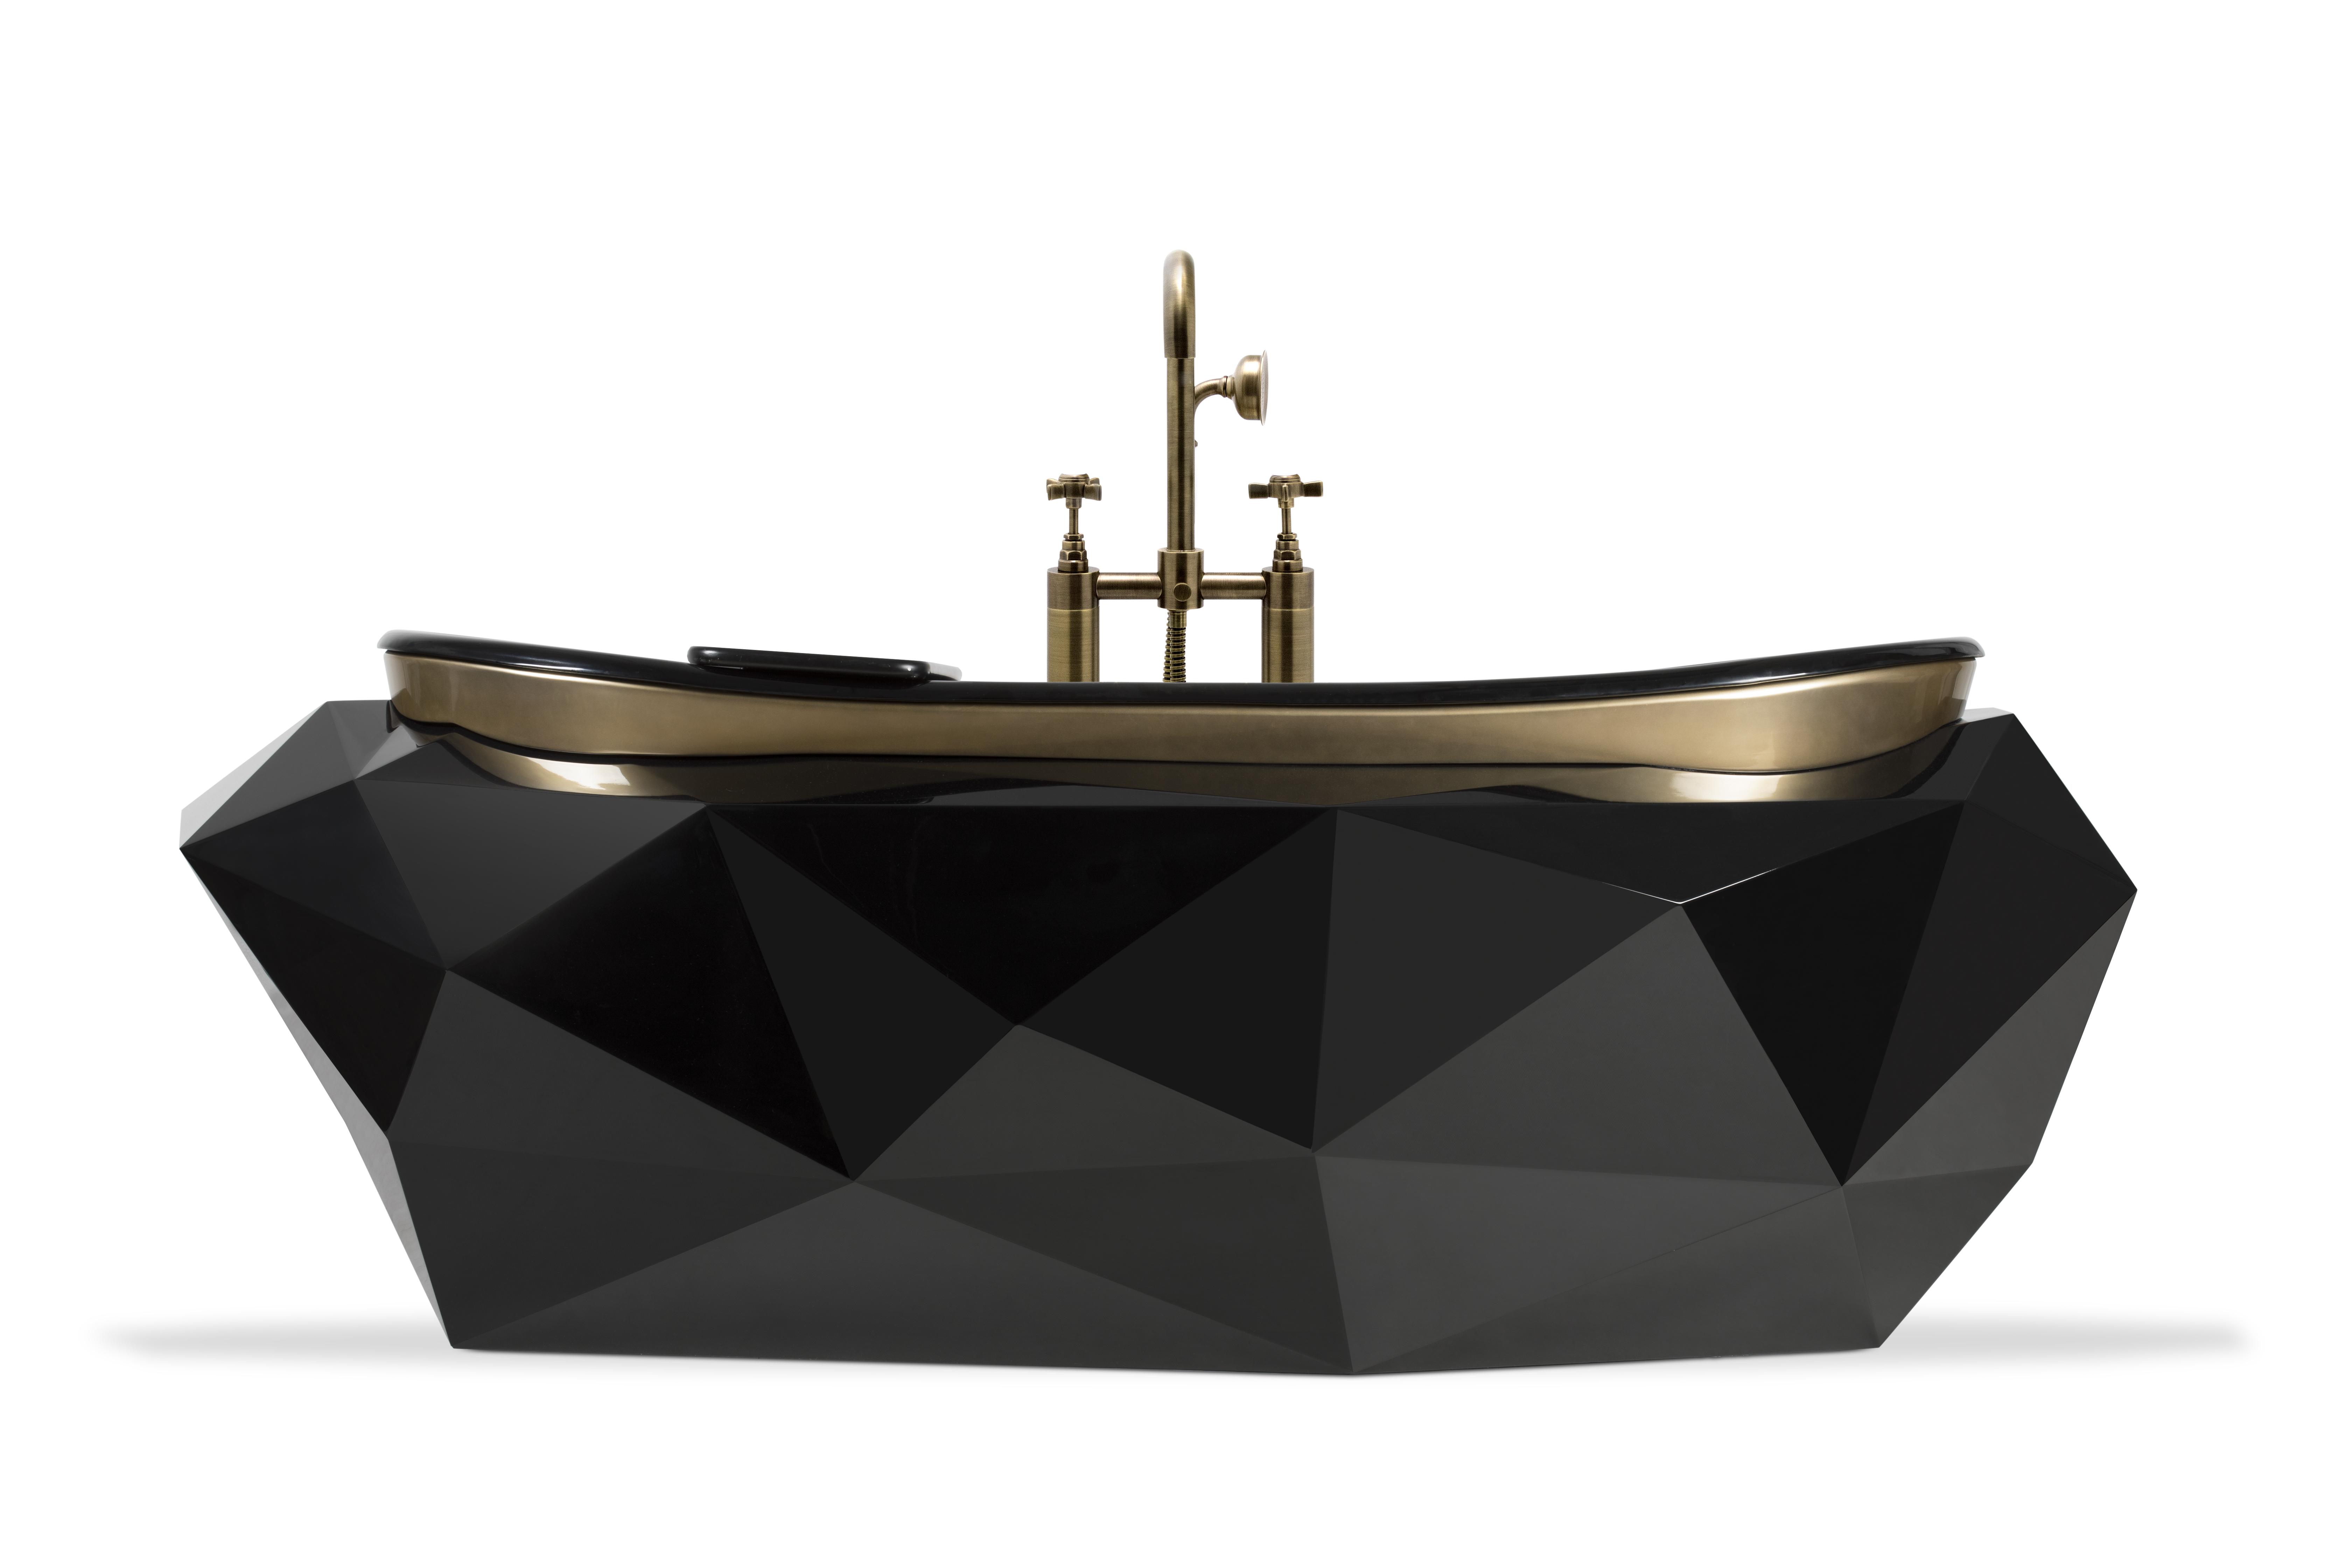 Shake up your bathroom with Maison Valentina´s luxurious bathtubs luxurious bathtubs Shake up your bathroom with Maison Valentina´s luxurious bathtubs diamond bathtub 1